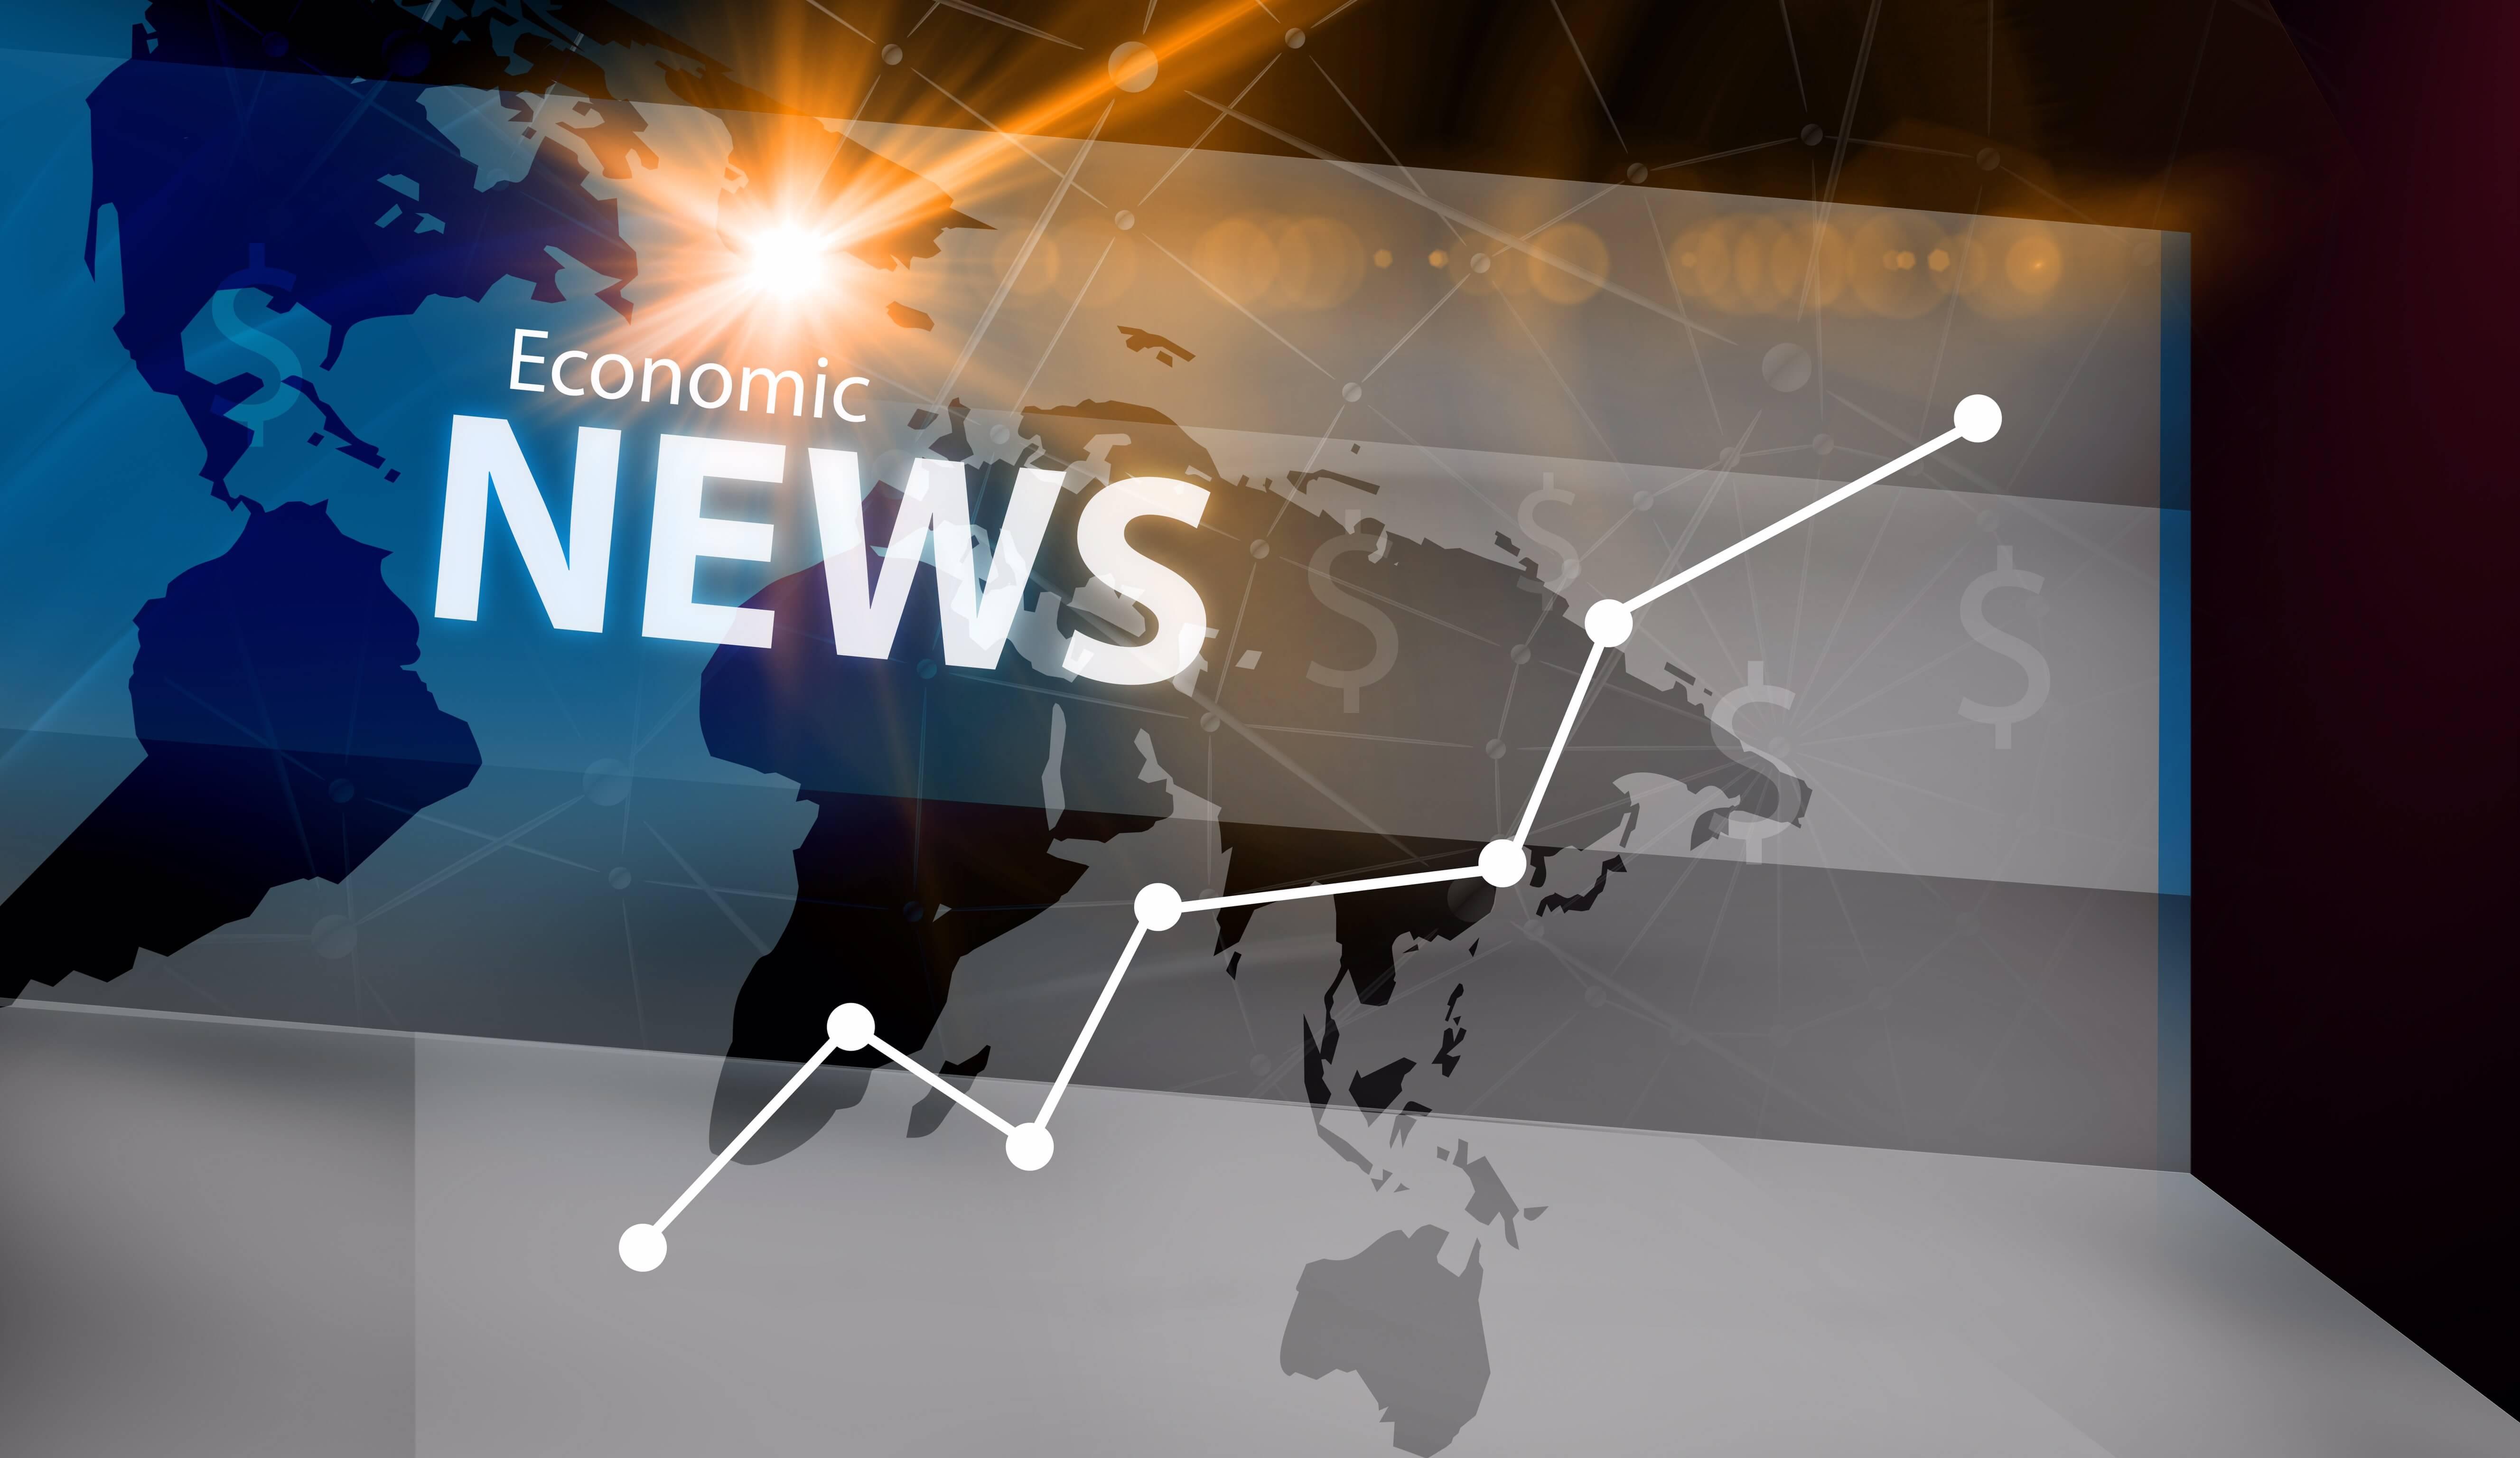 Economic Update — economic news displayed on the globe